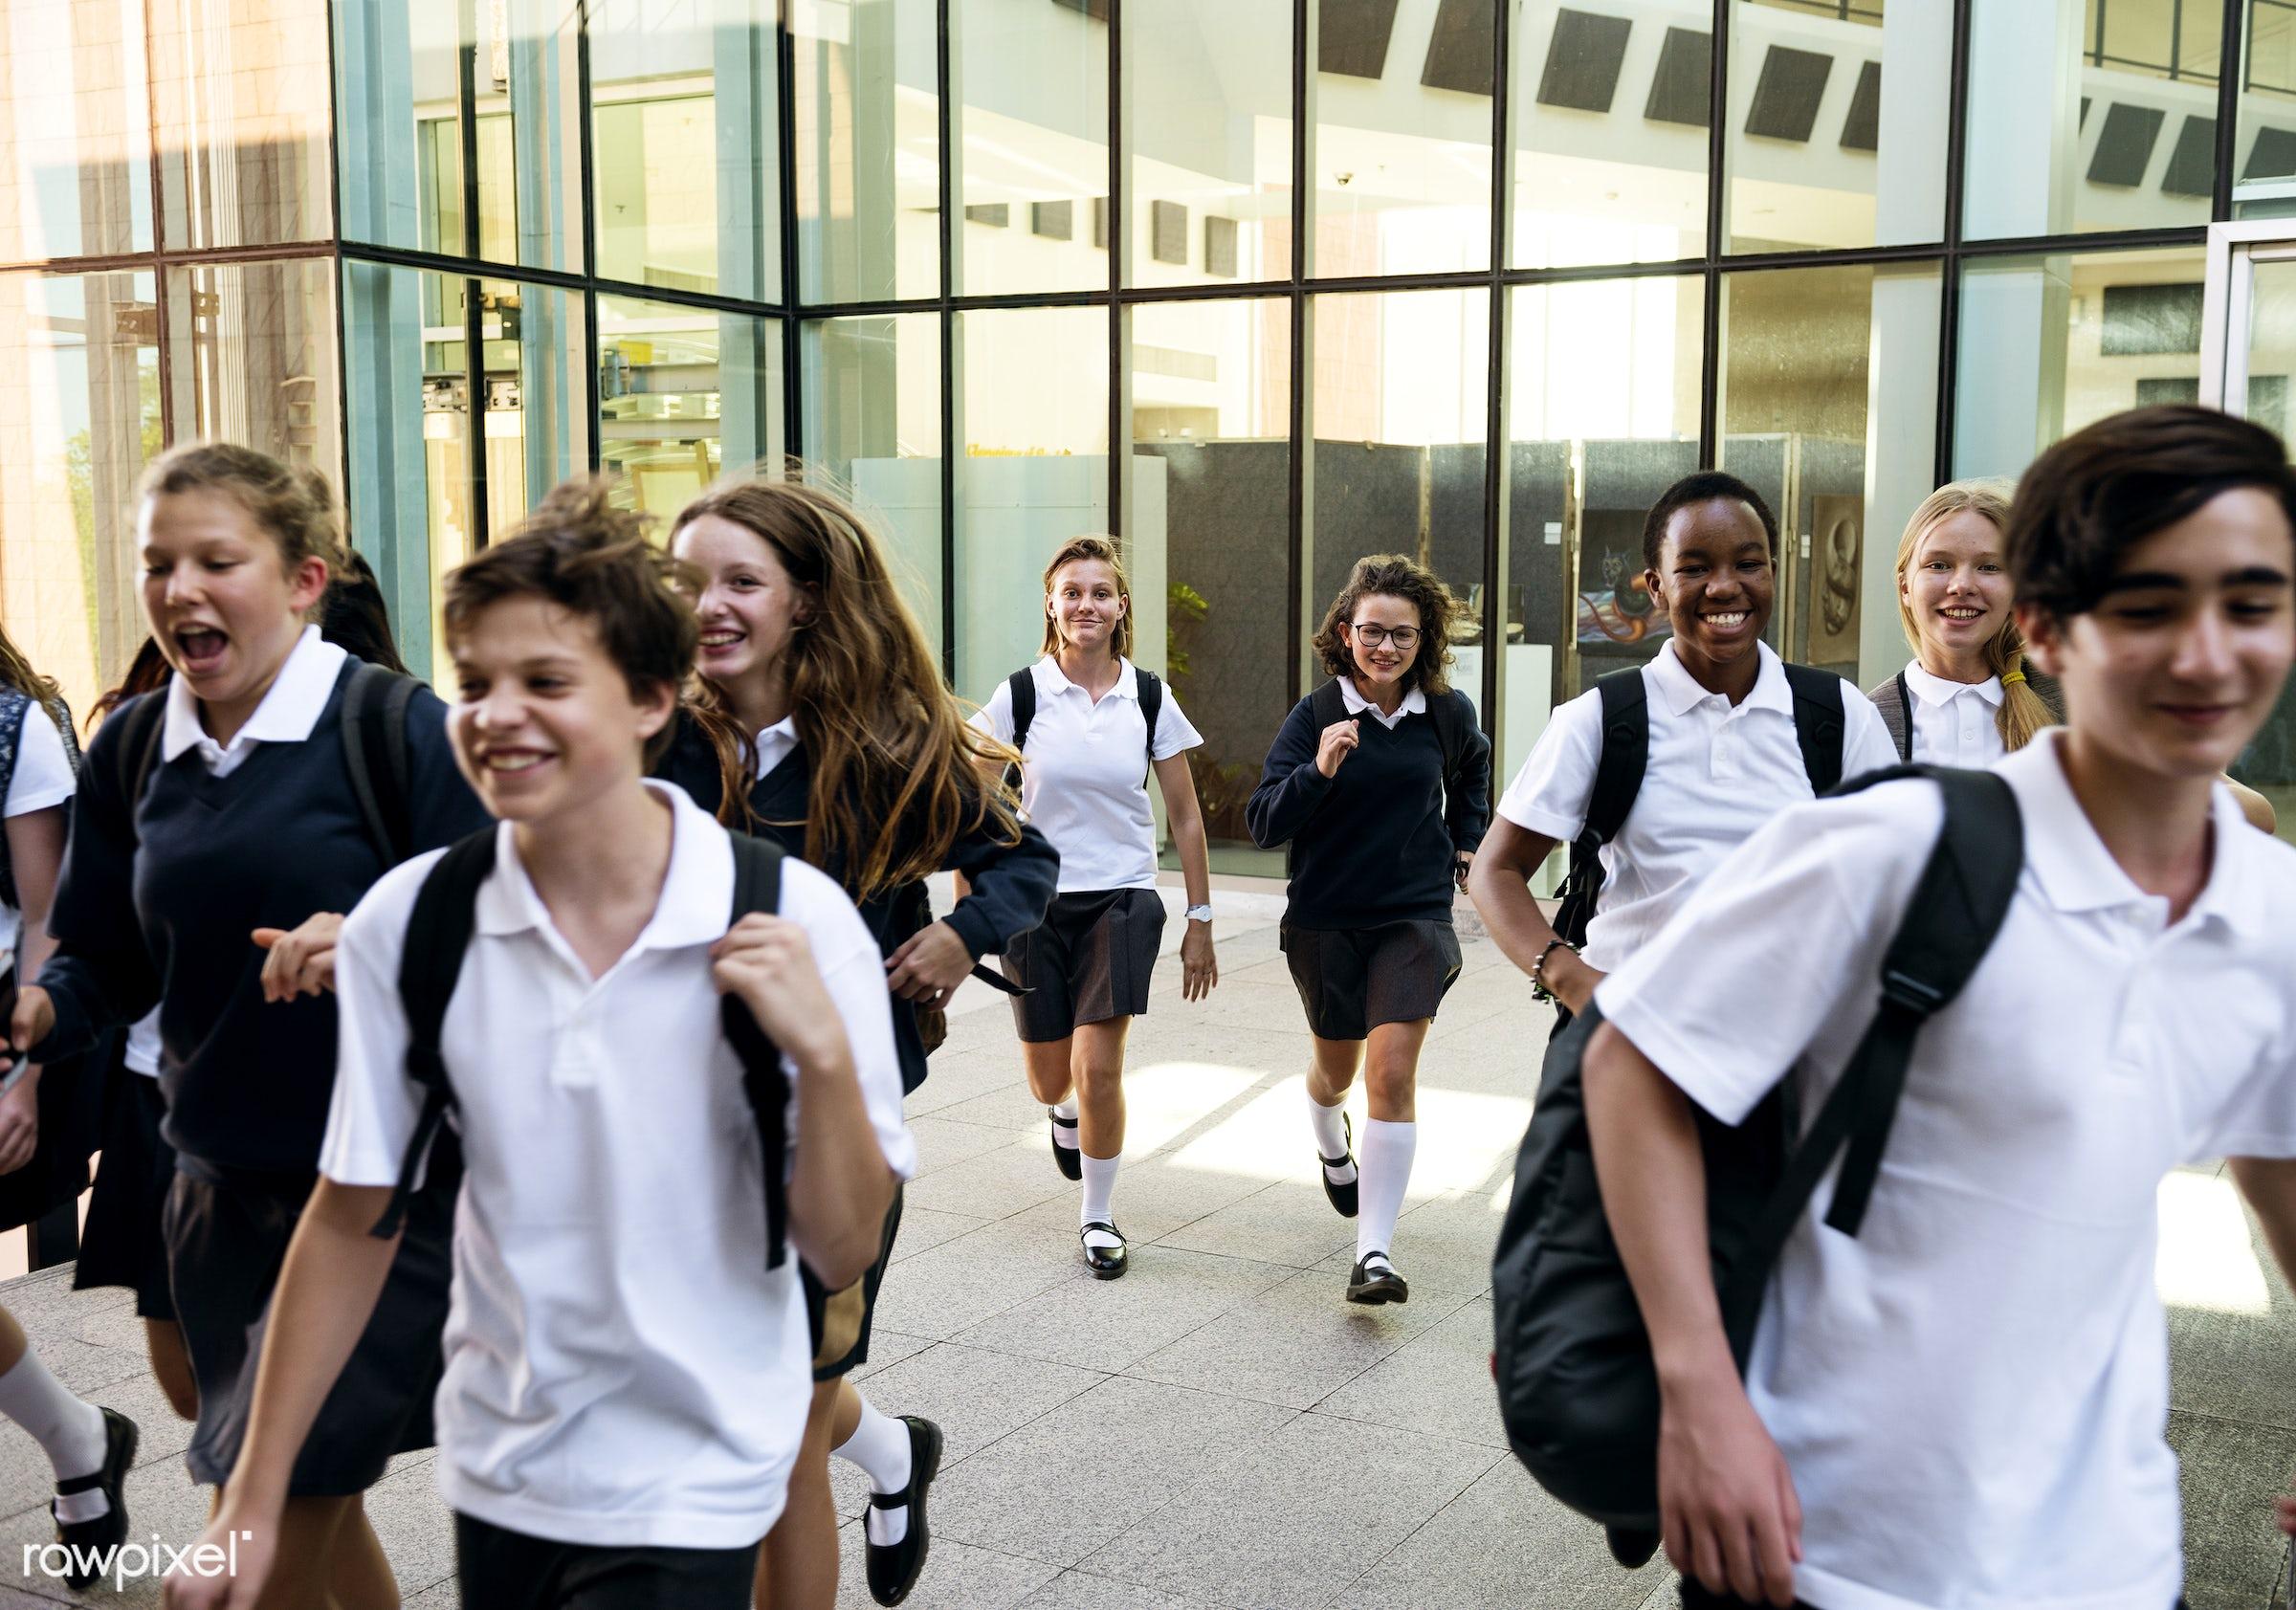 walking, knowledge, wisdom, education, people, together, caucasian, academic, teenage, friends, lifestyle, boys, casual, men...